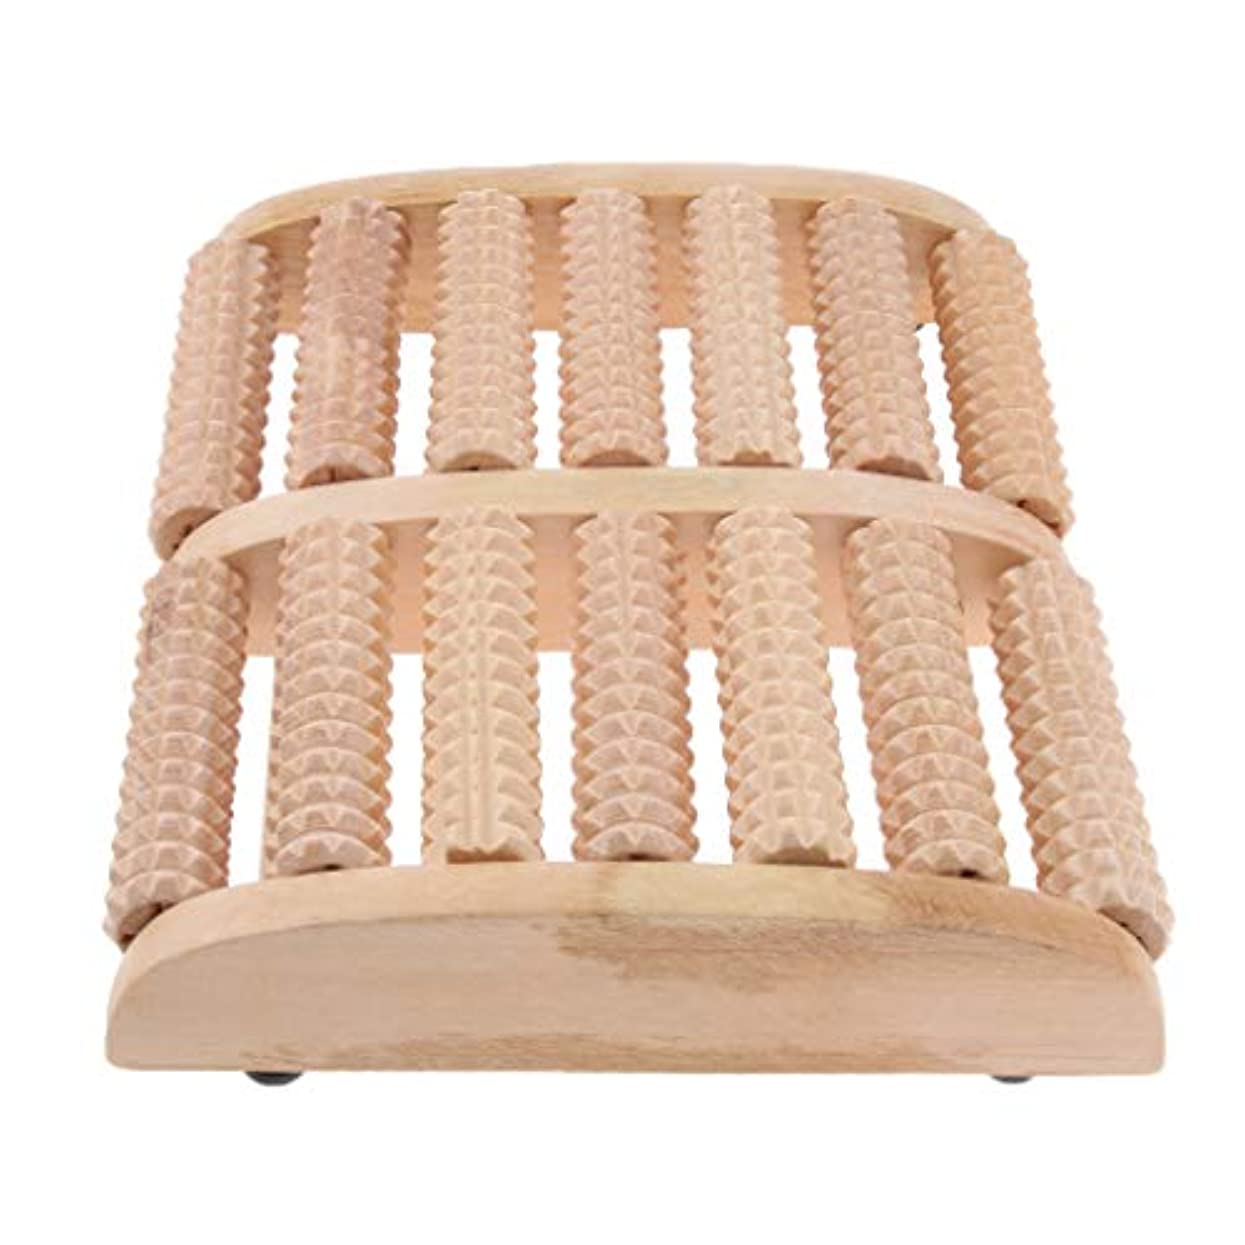 IPOTCH マッサージローラー 7行 自然木製 足踏み フットマッサージ ツボ押し 痛み緩和 健康器具 高品質